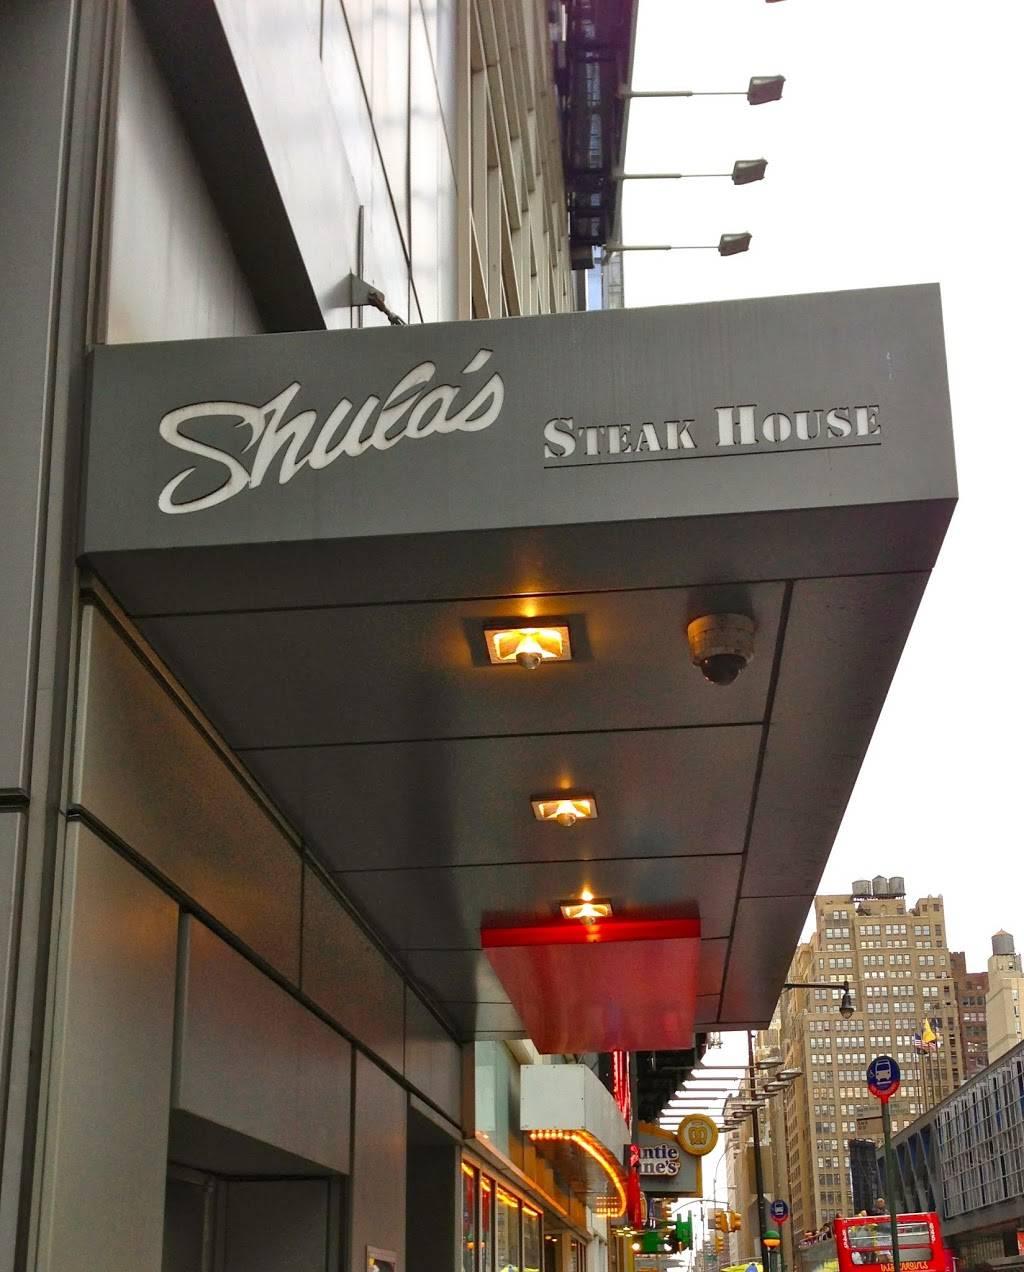 Shulas Steak House | restaurant | 270 W 43rd St, New York, NY 10036, USA | 2122012776 OR +1 212-201-2776